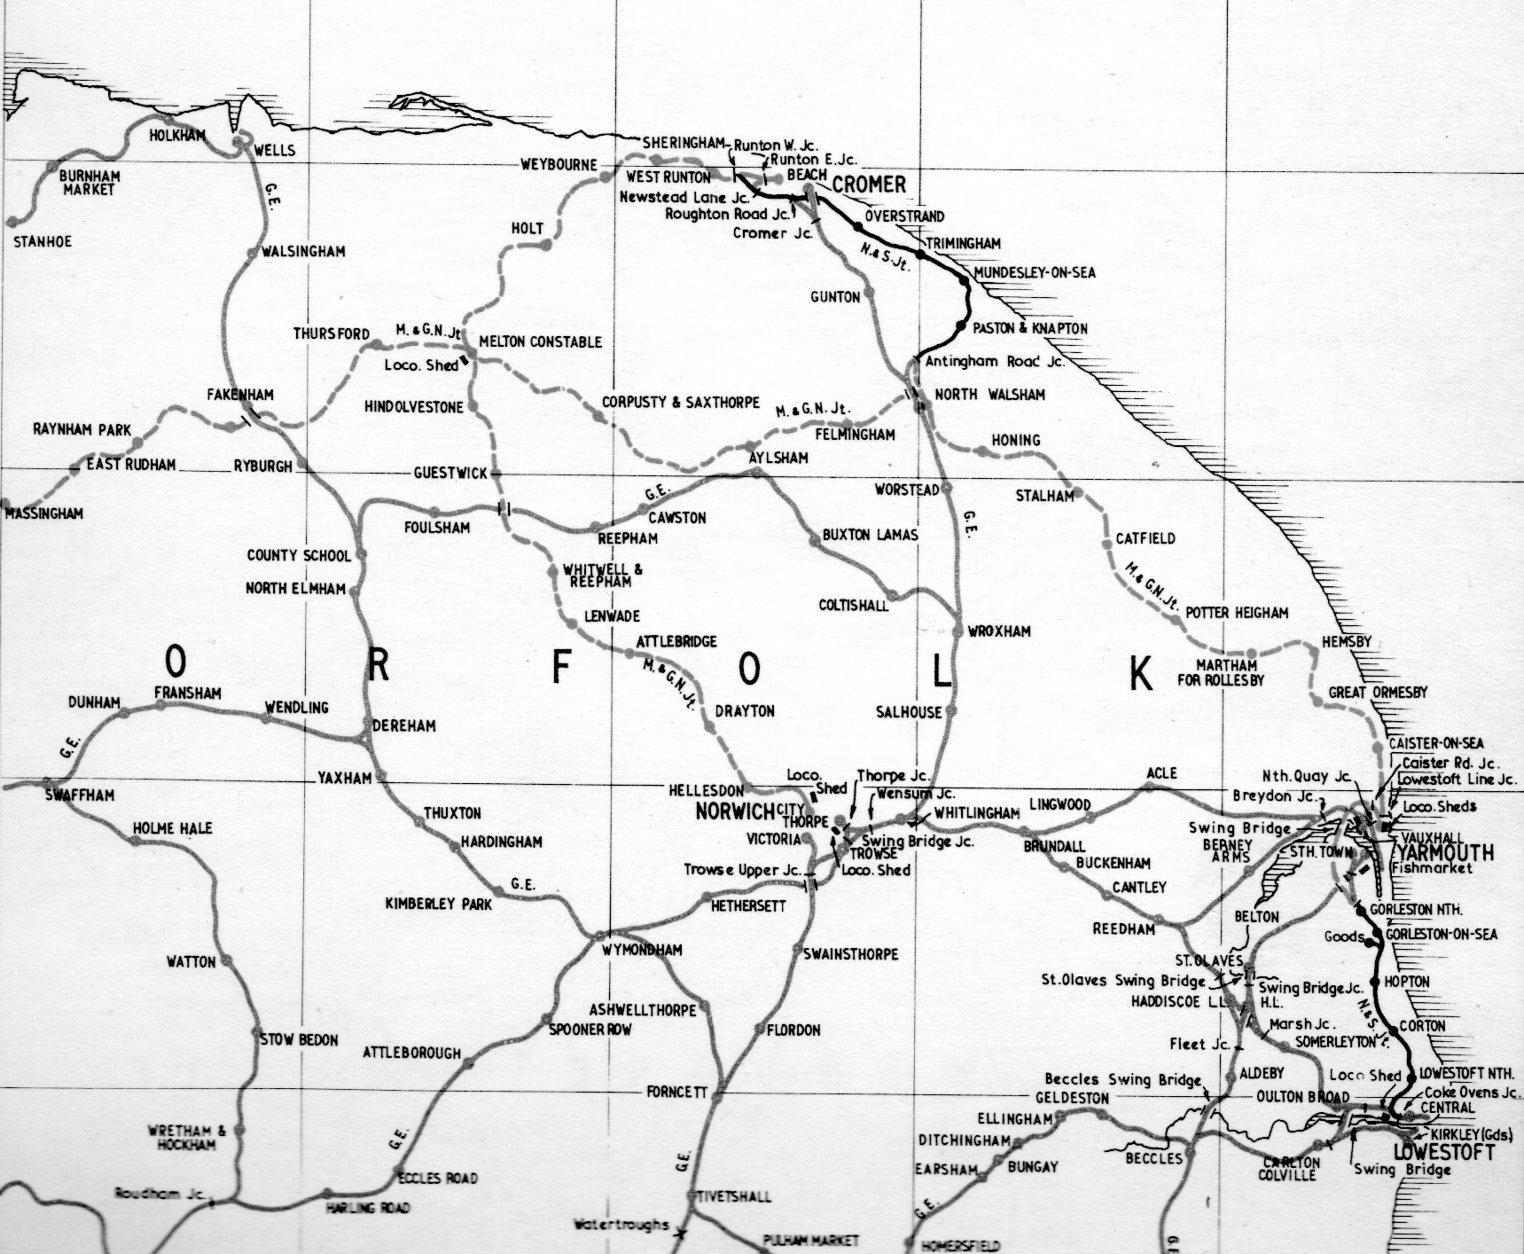 East norfolk's railways